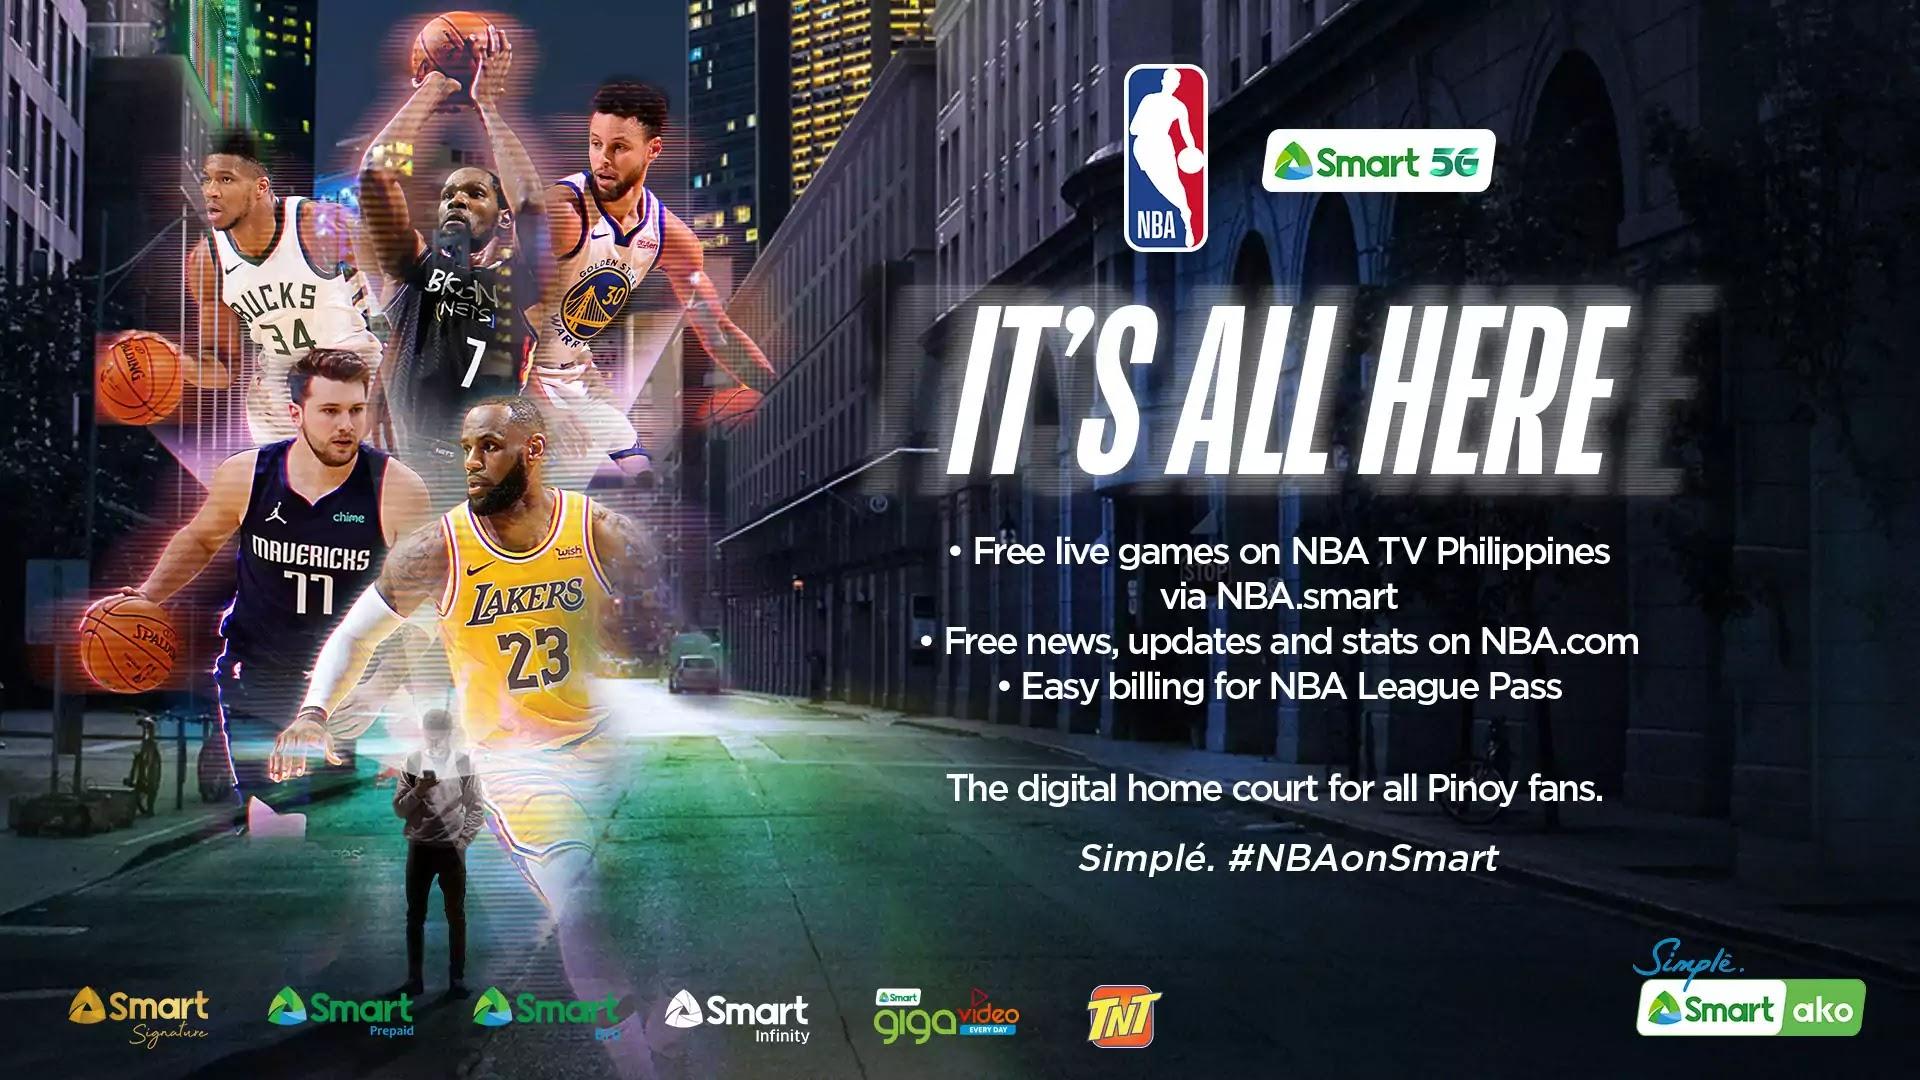 Smart x NBA